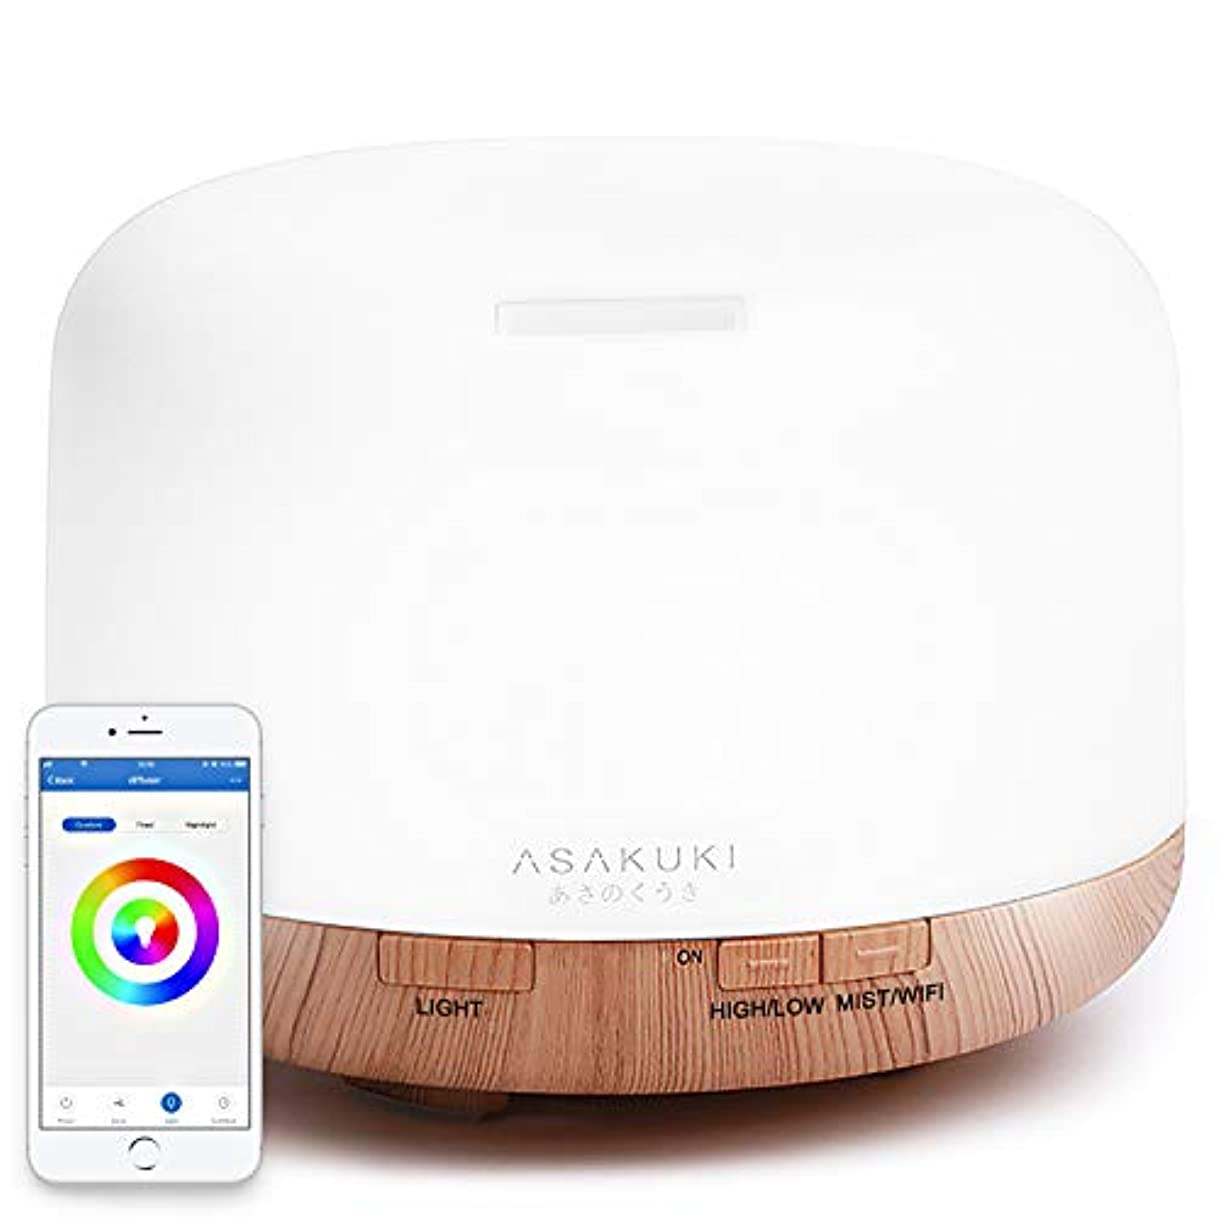 ASAKUKI ベッドルーム、オフィス、より良い睡眠&呼吸 雰囲気を緩和するアレクサ2019アップグレード設計500ミリリットルアロマ加湿器と互換性 あるスマート -エッセンシャルオイルディフューザーアプリ制御 標準 2018...